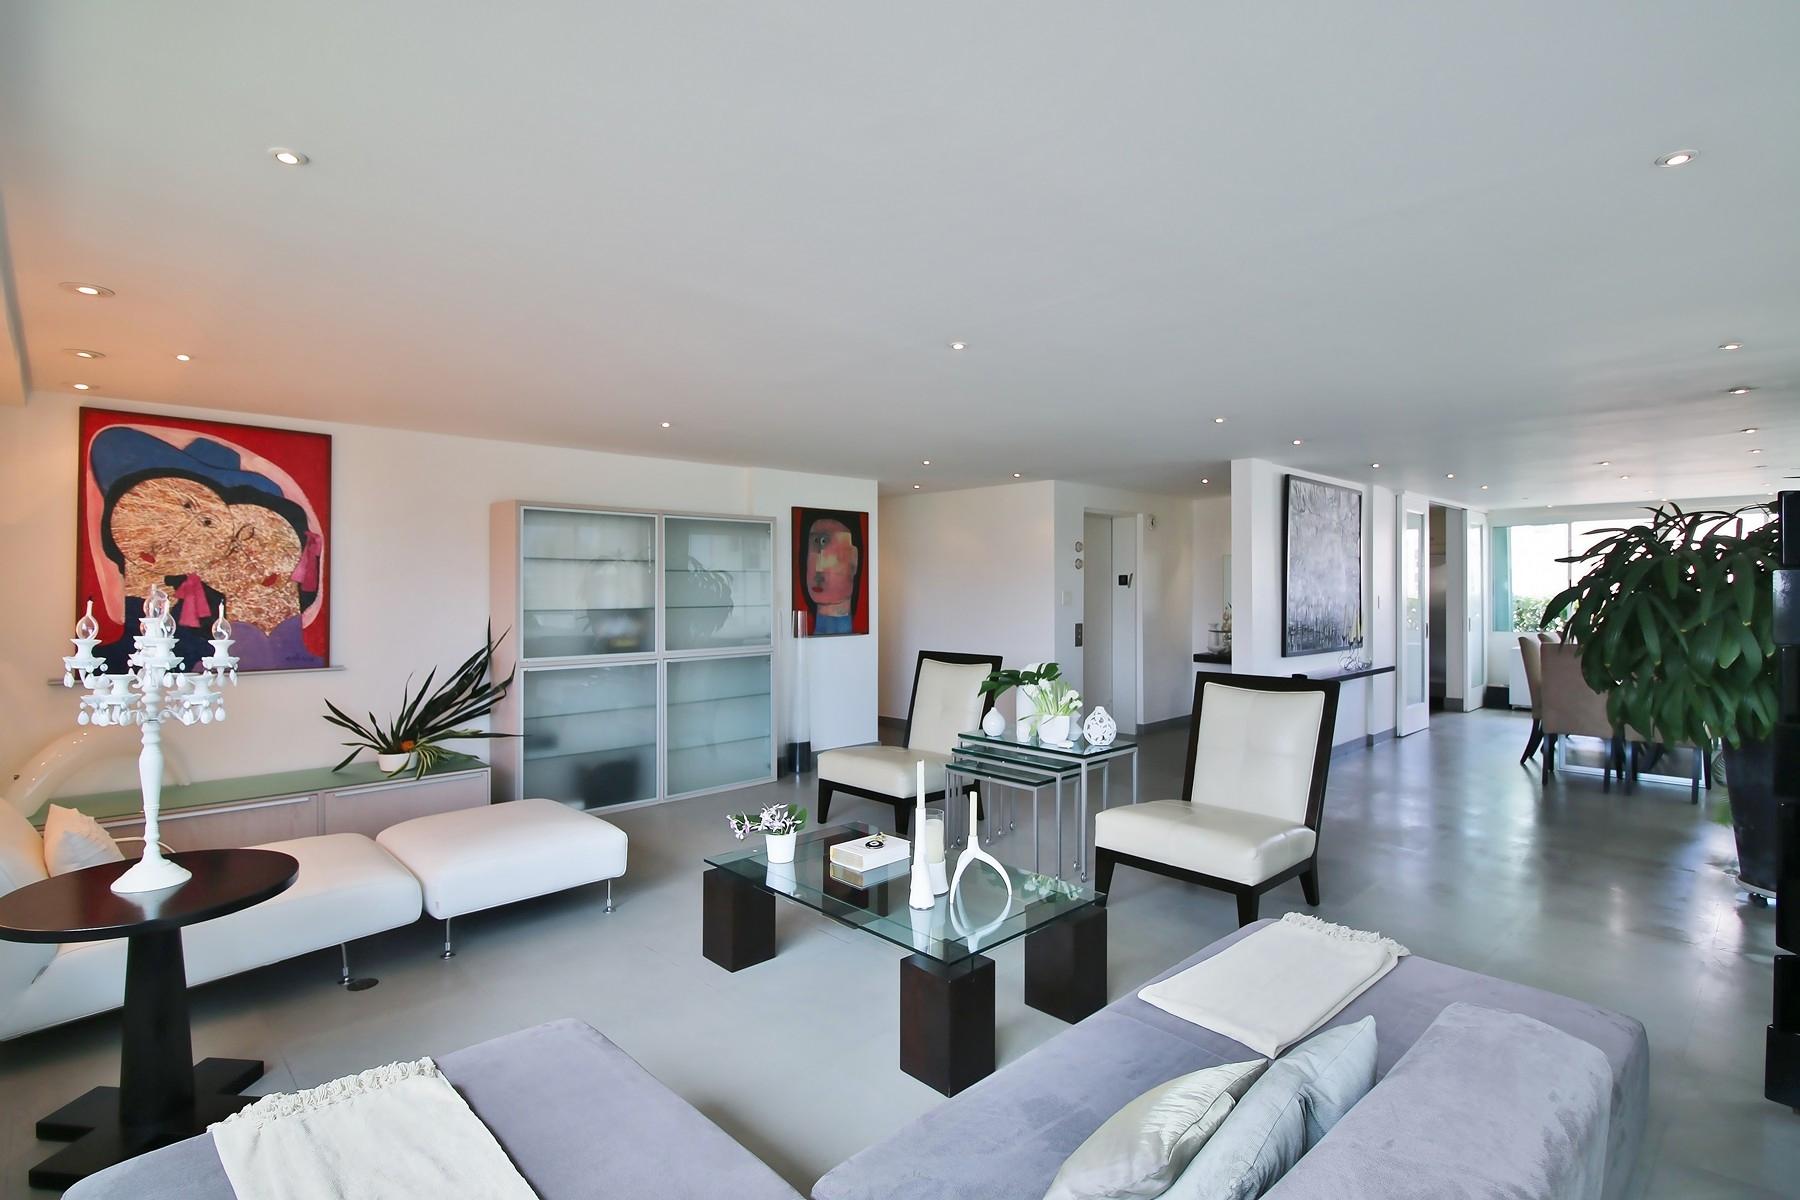 Condominium for Sale at 1372 Luchetti by the Park 1372 Calle Luchetti San Juan, Puerto Rico 00907 Puerto Rico